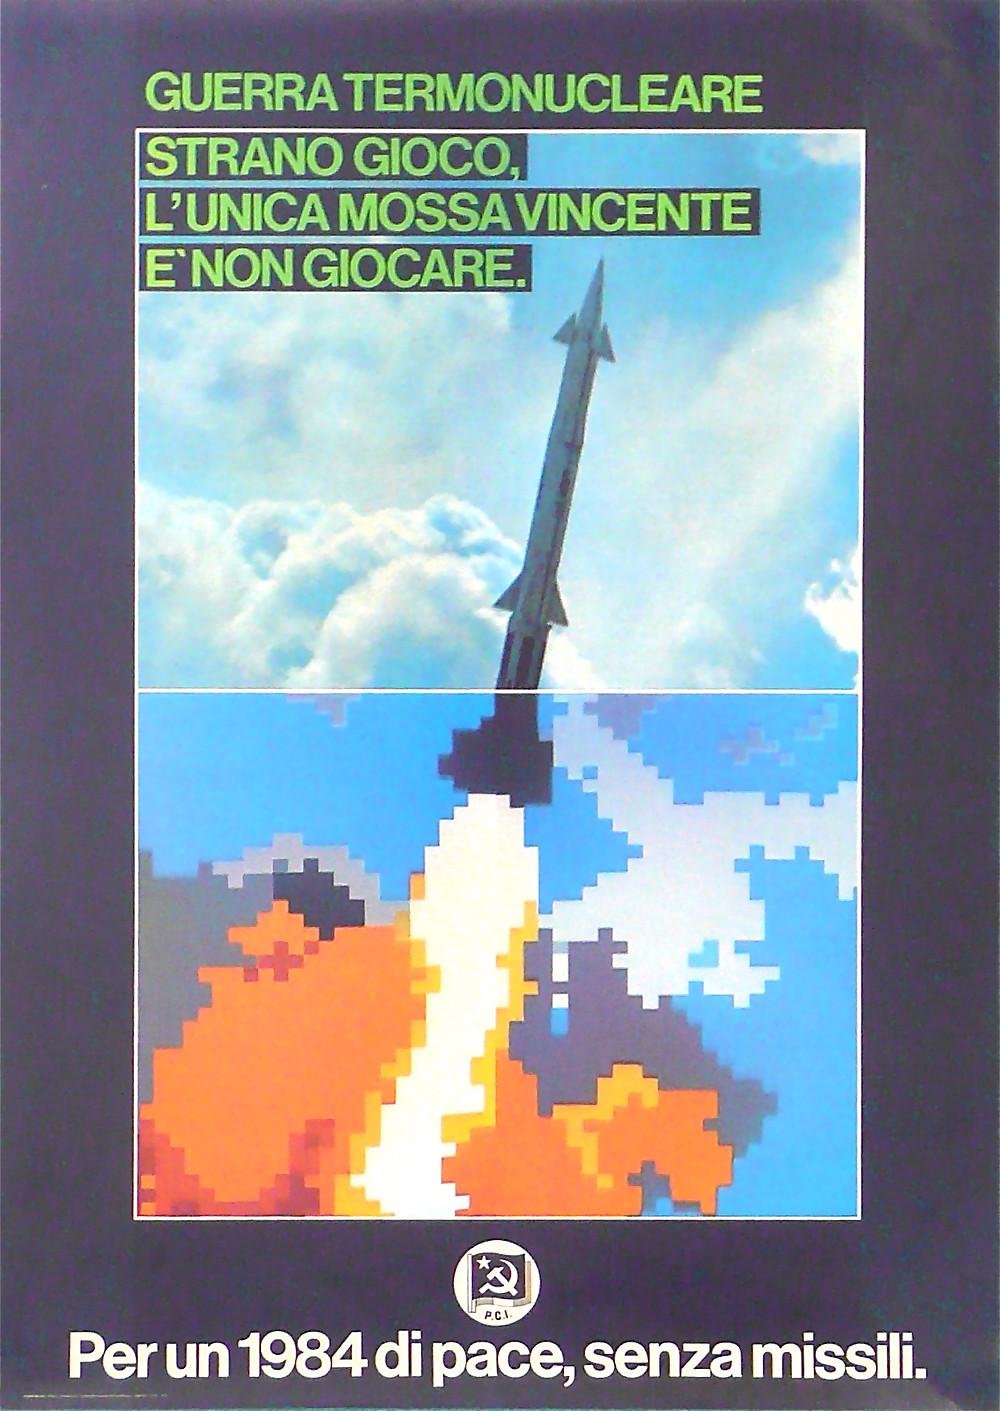 img 6_manifesto contro guerra 1984.JPG